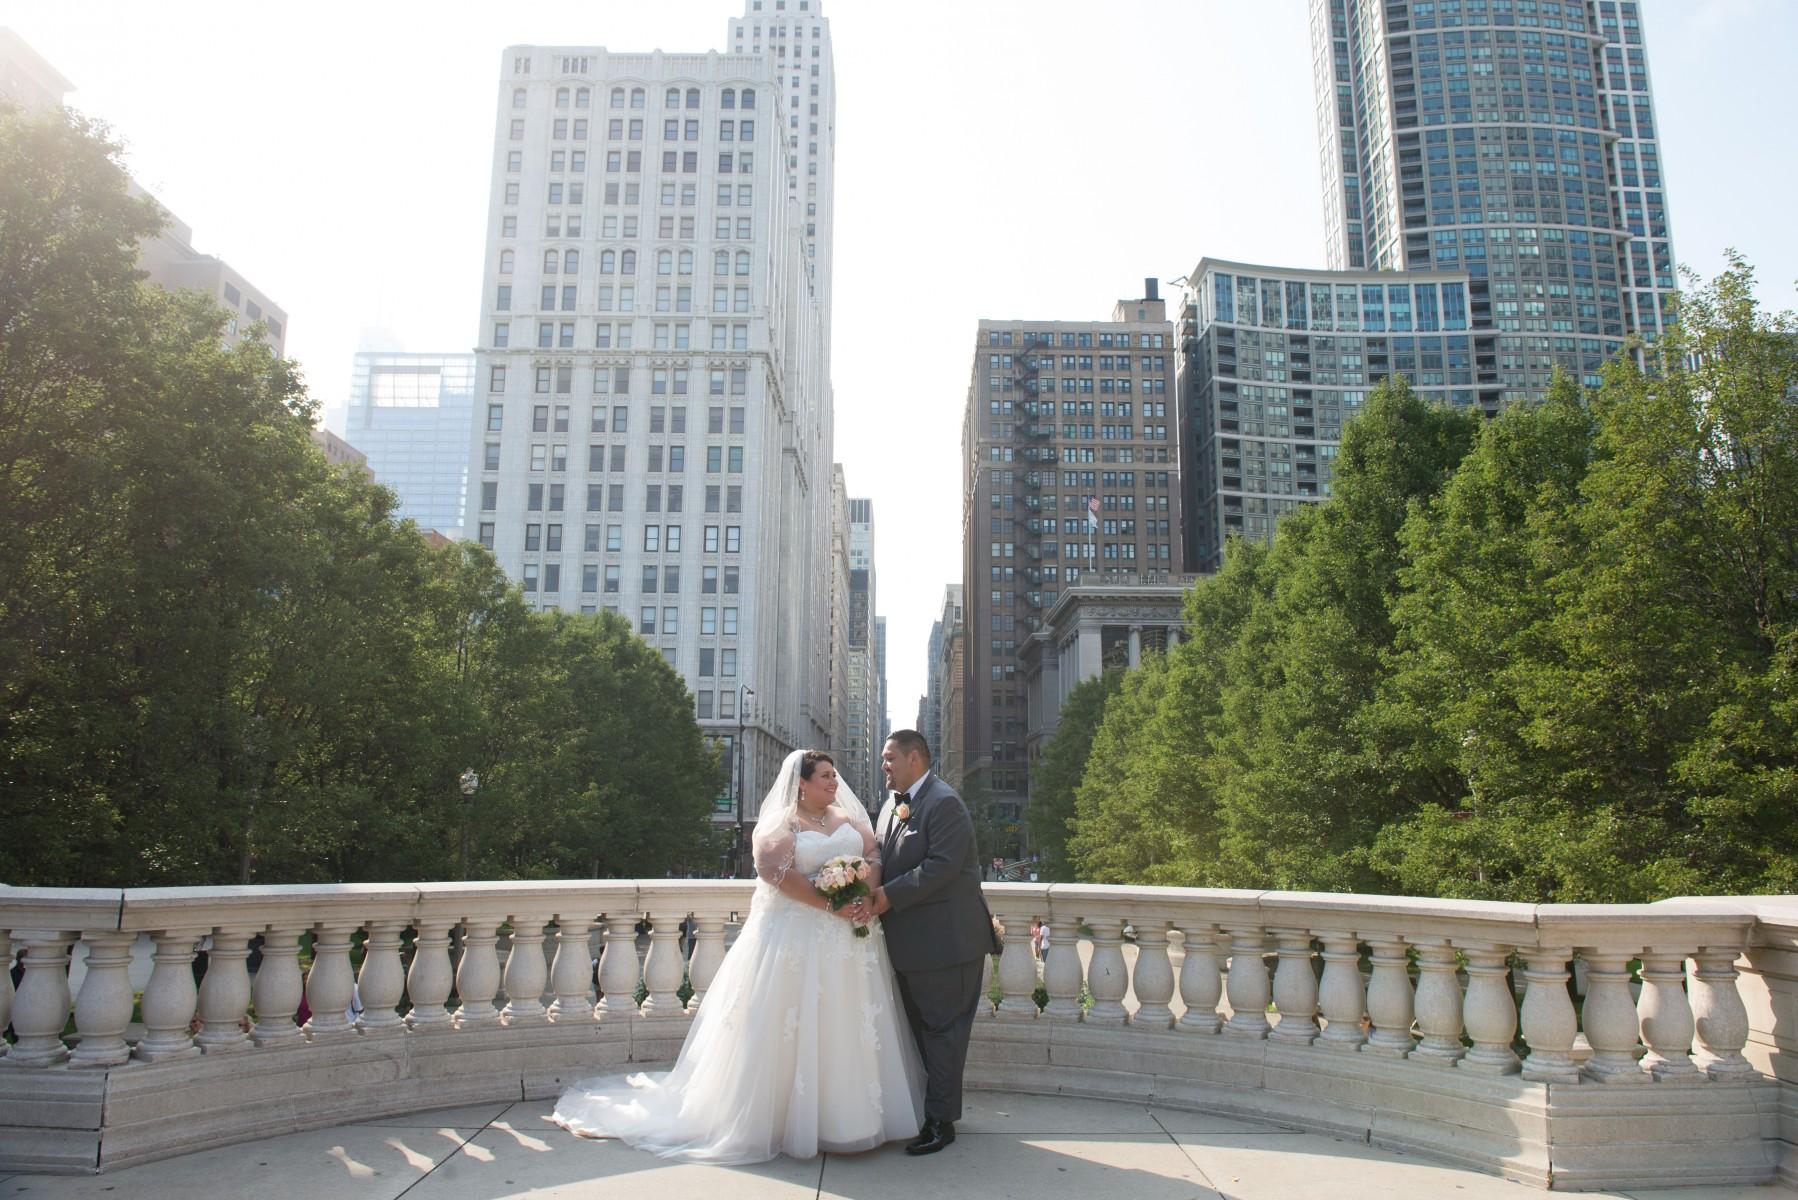 BridesbyYoung-RealBride-PlusSizeCurvyWeddingDress-MargieMichael-41.jpg